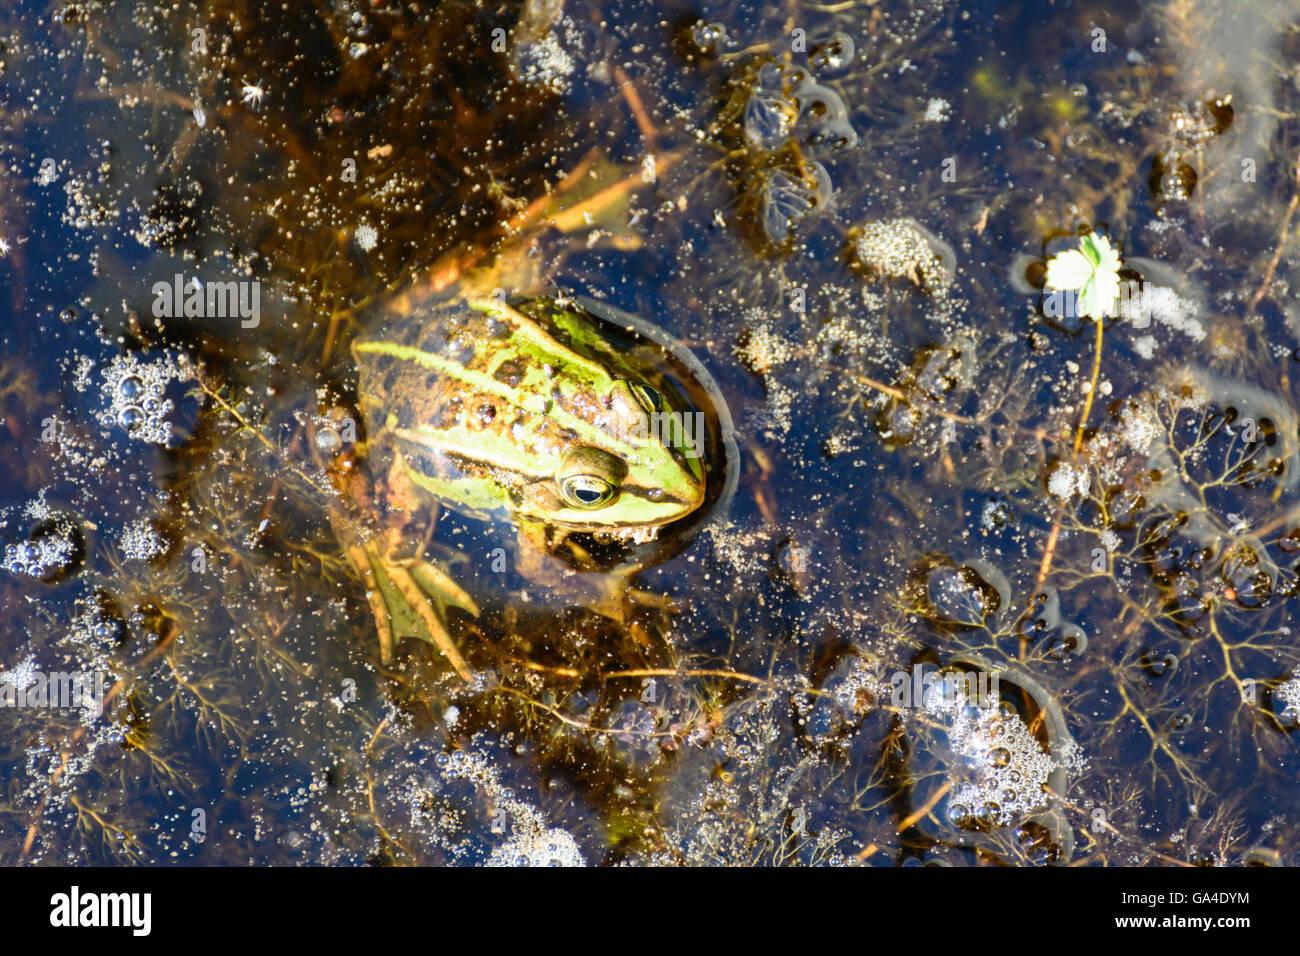 Schrems Pond Frog ( Pelophylax kl . Esculentus Pelophylax ' esculentus ' or Rana ' esculenta ' ) - Stock Image